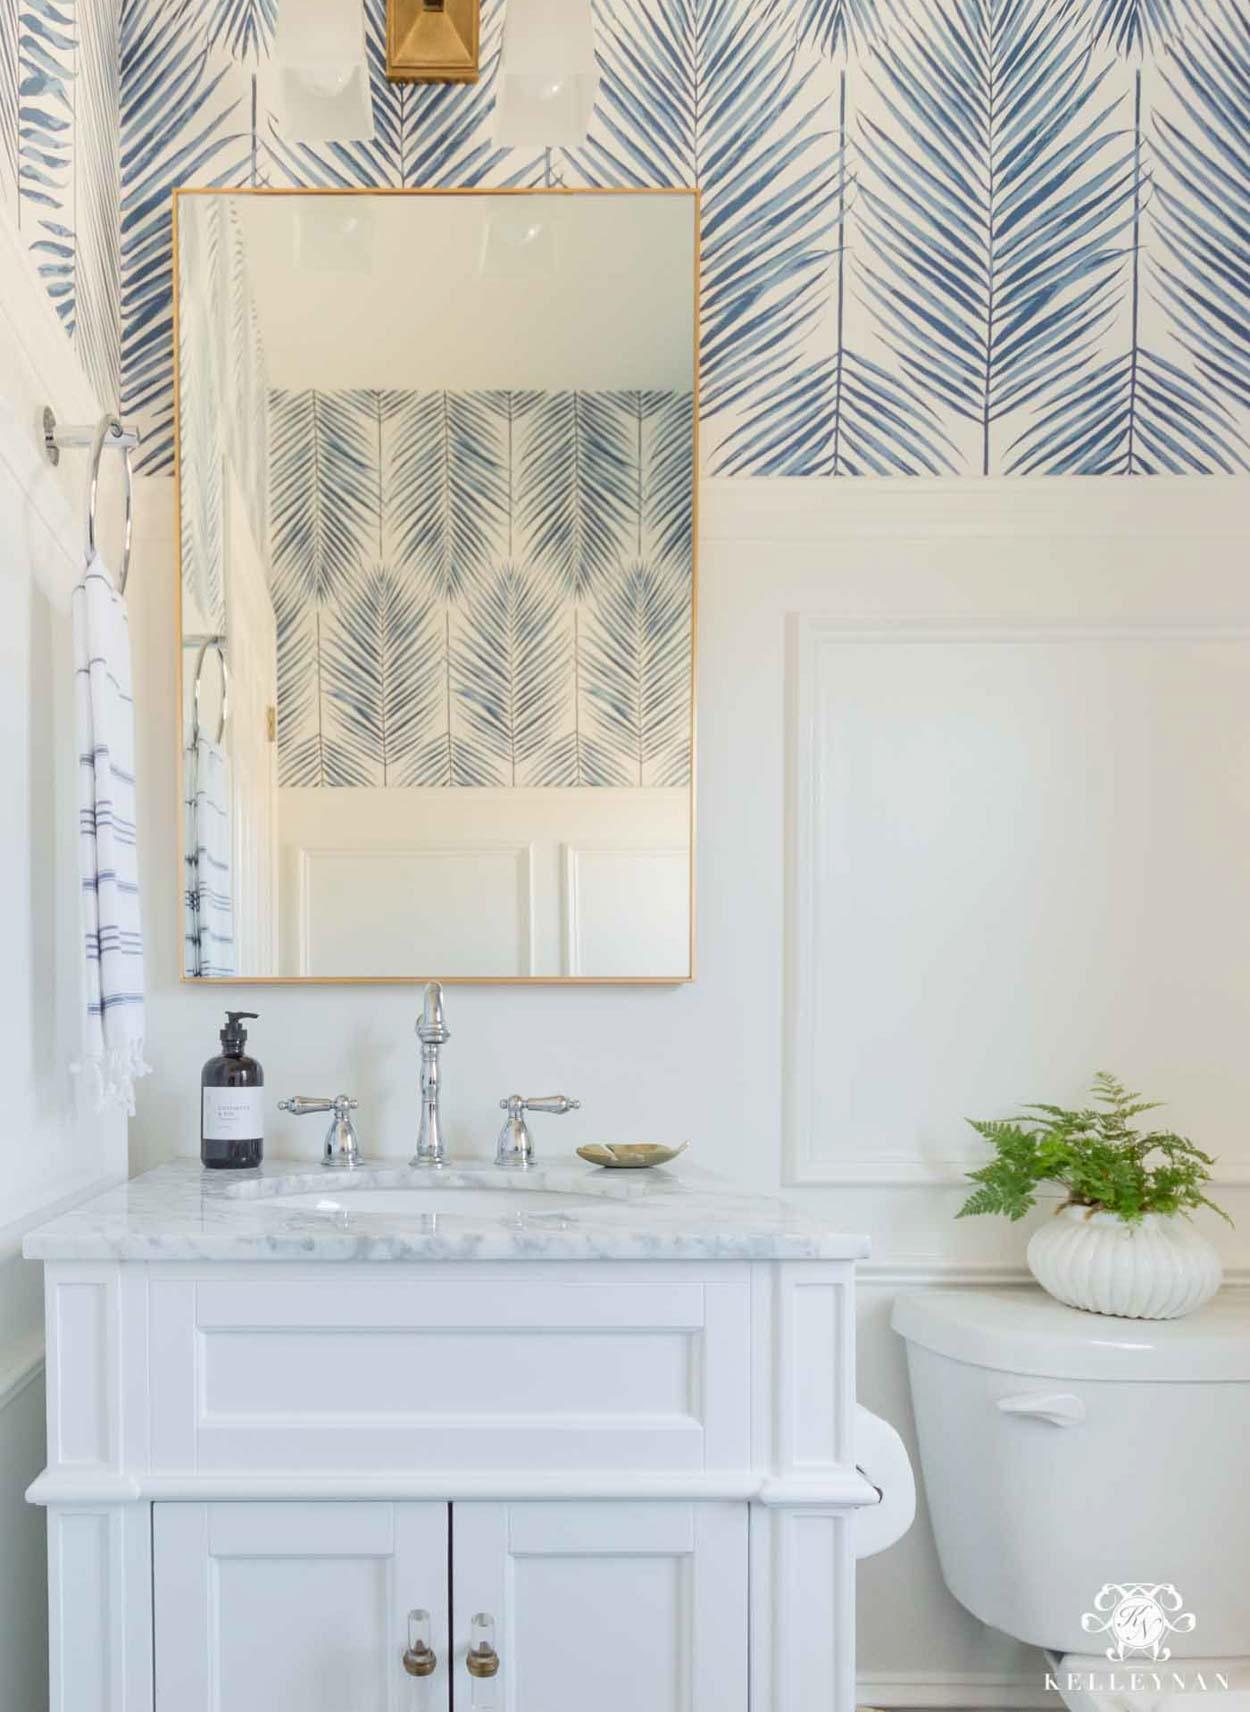 16 Small Bathroom Vanities 24 Inches, Vanity Small Bathroom